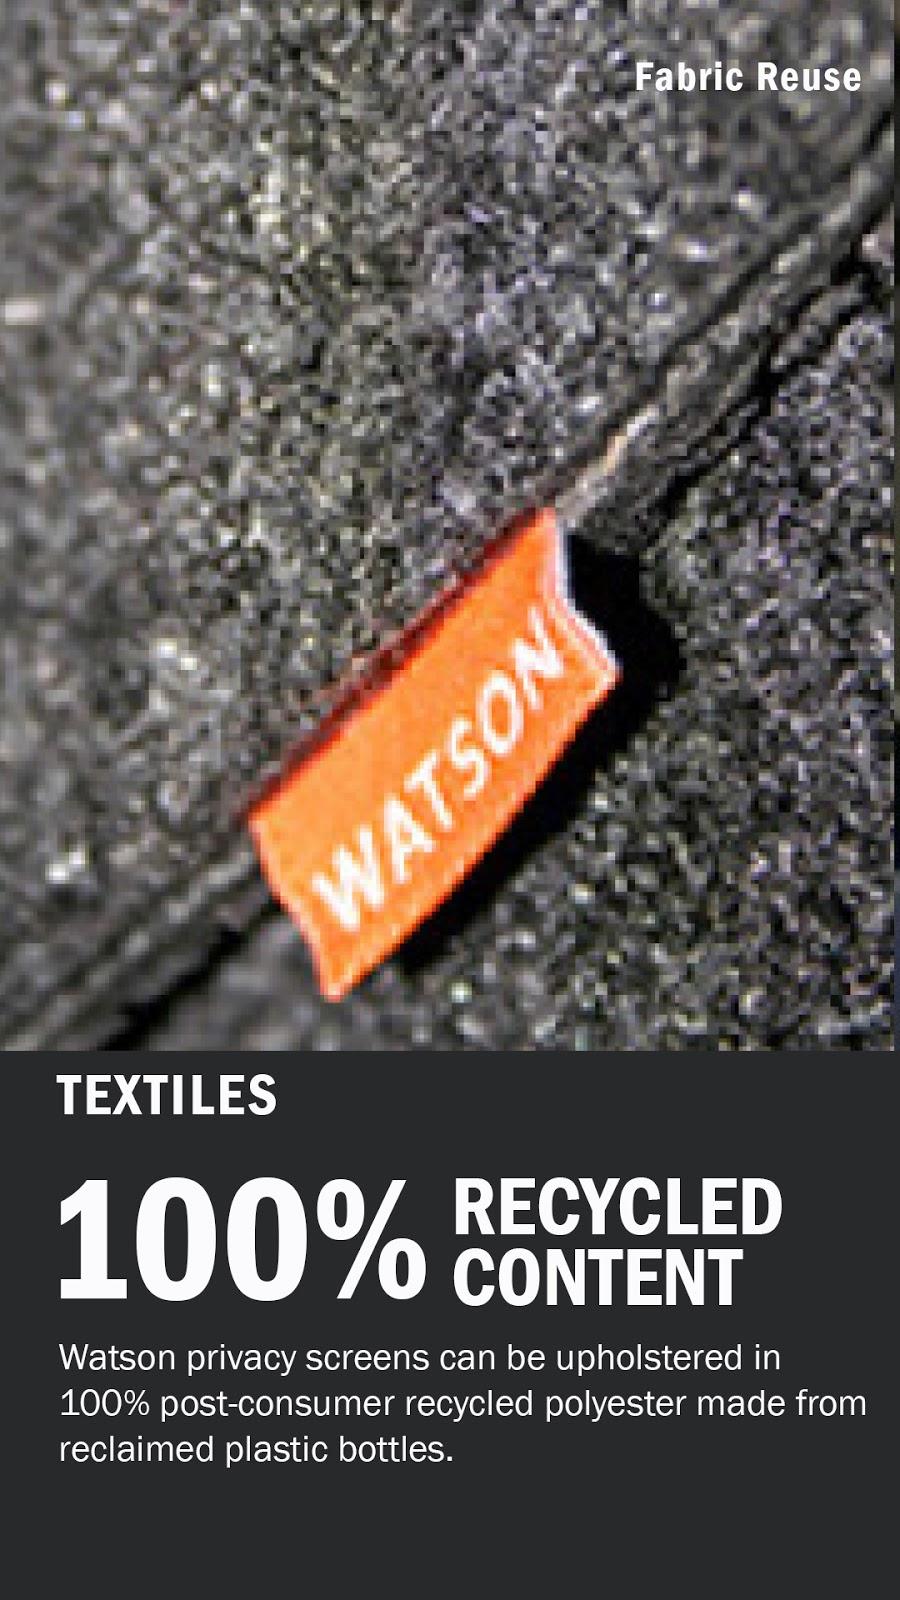 Fabric Reuse